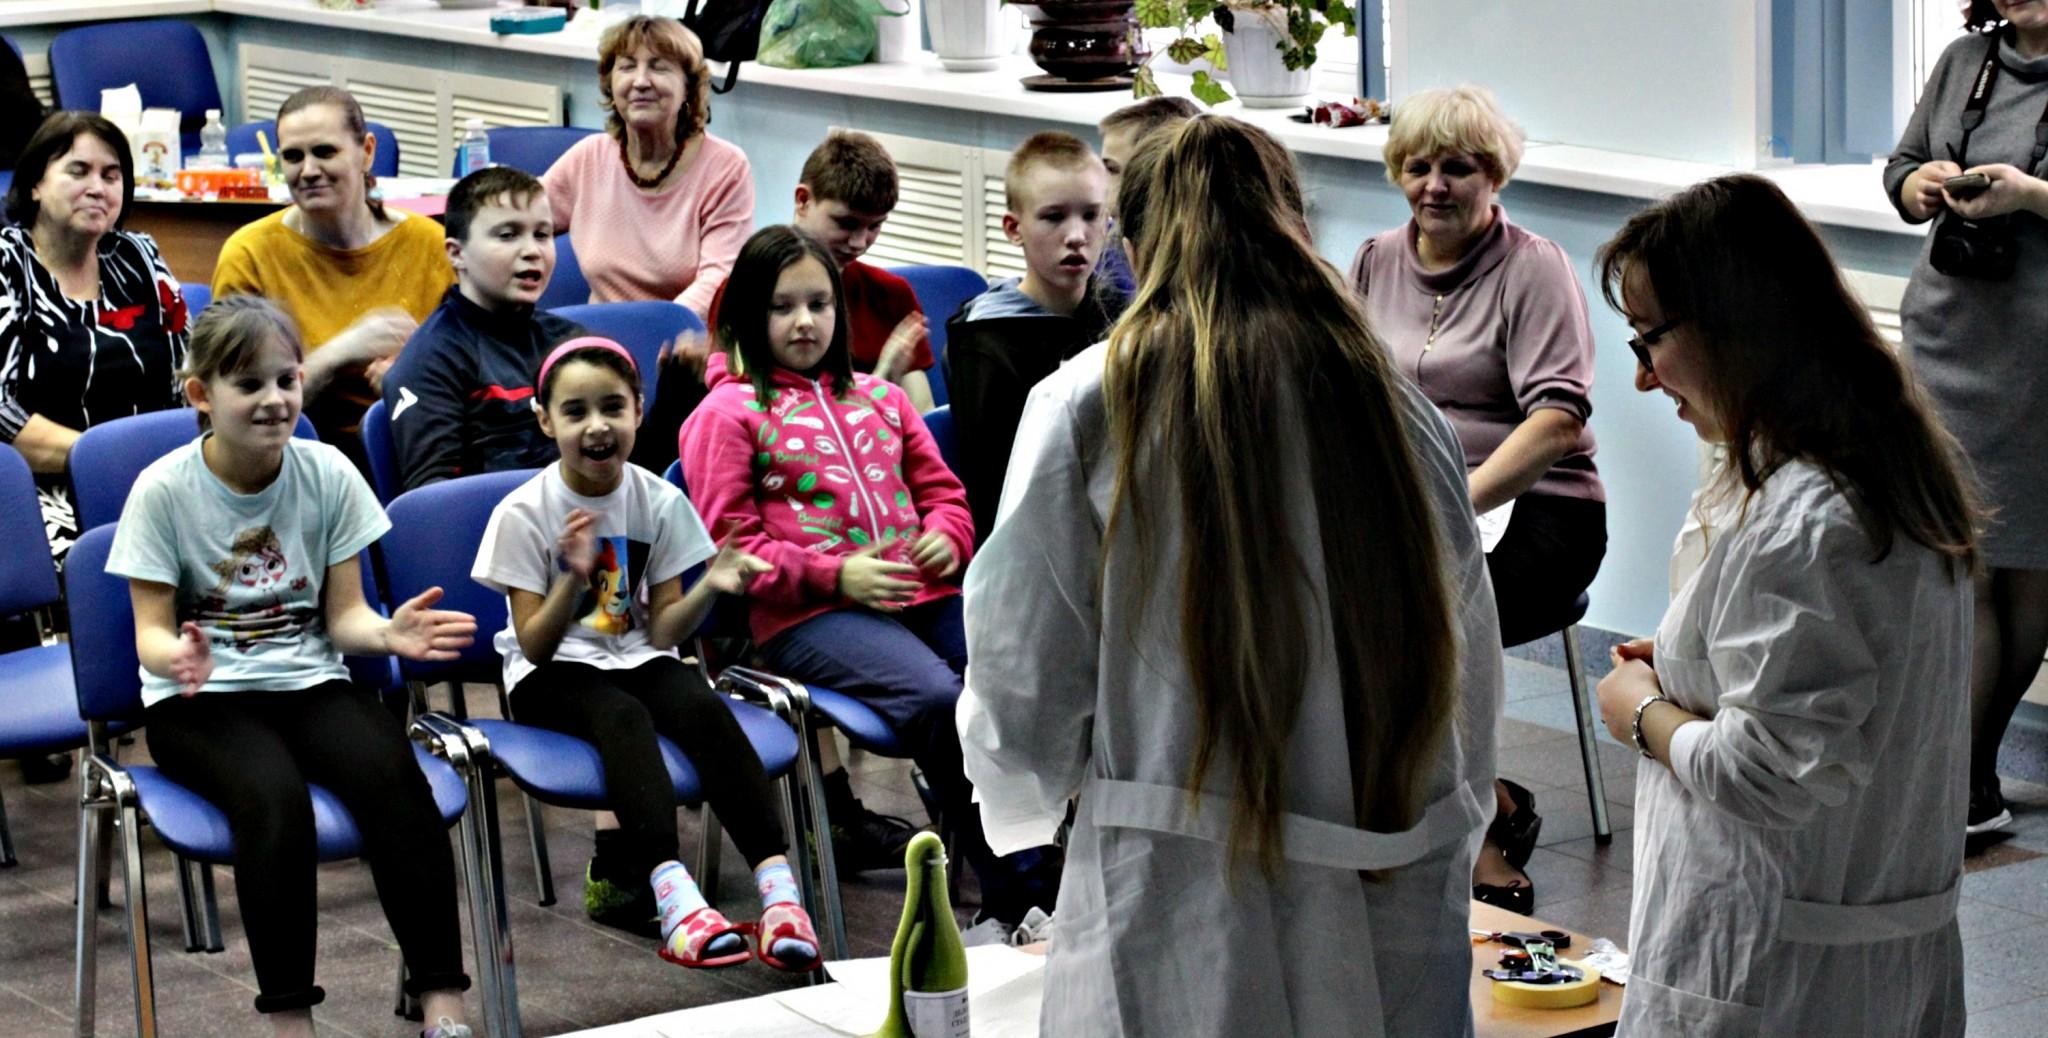 Skoltech students Julia Vasina (front left) and Valentina Ekimova amaze the children of the Mytishchi School of Musical Education with an experiment. Photo: Skoltech.